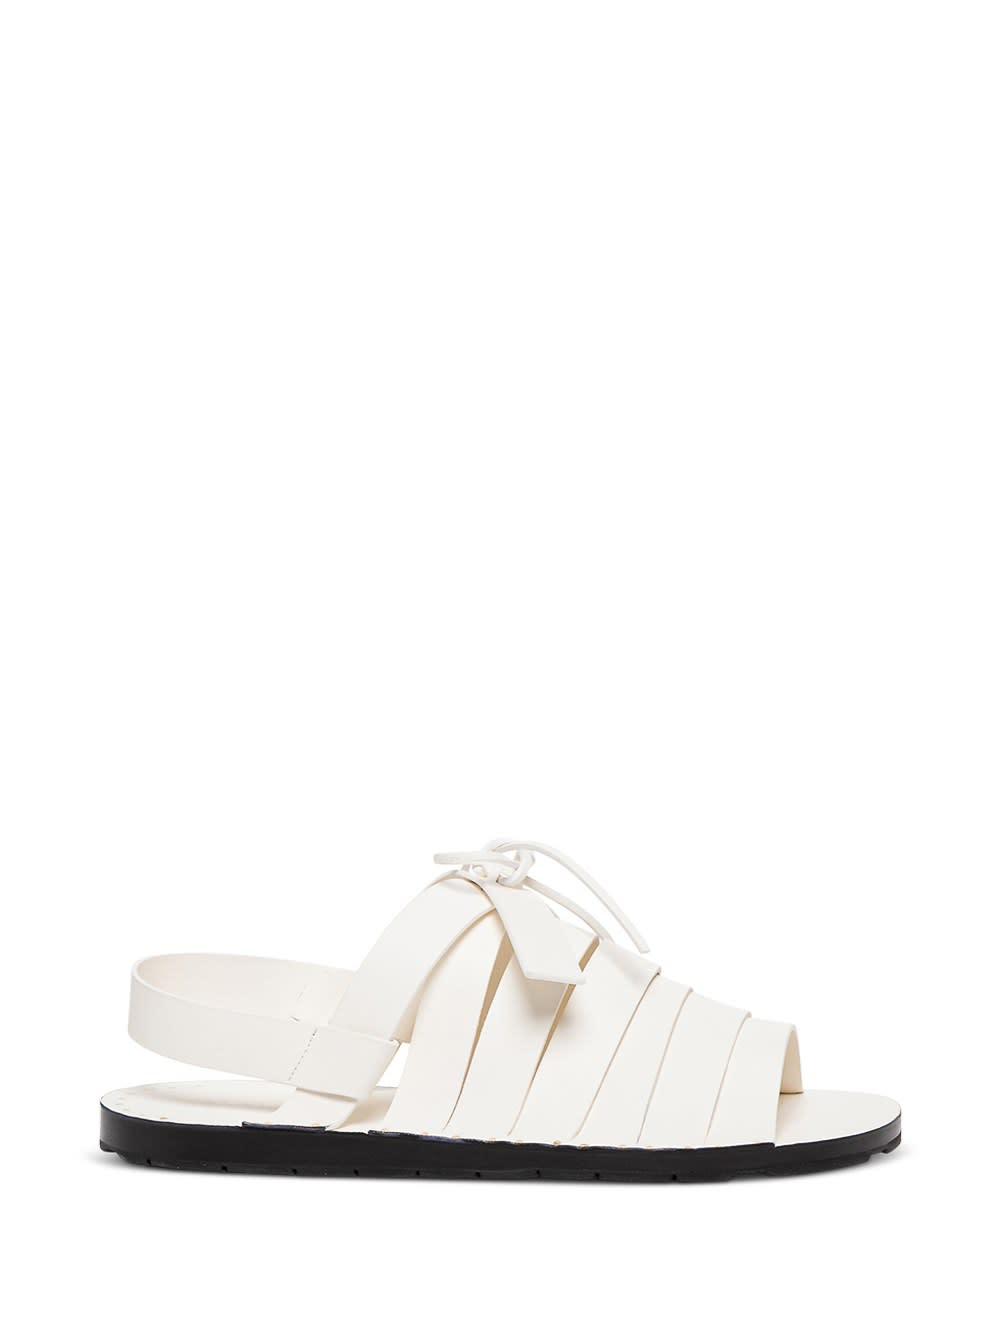 Jil Sander White Leather Sandals